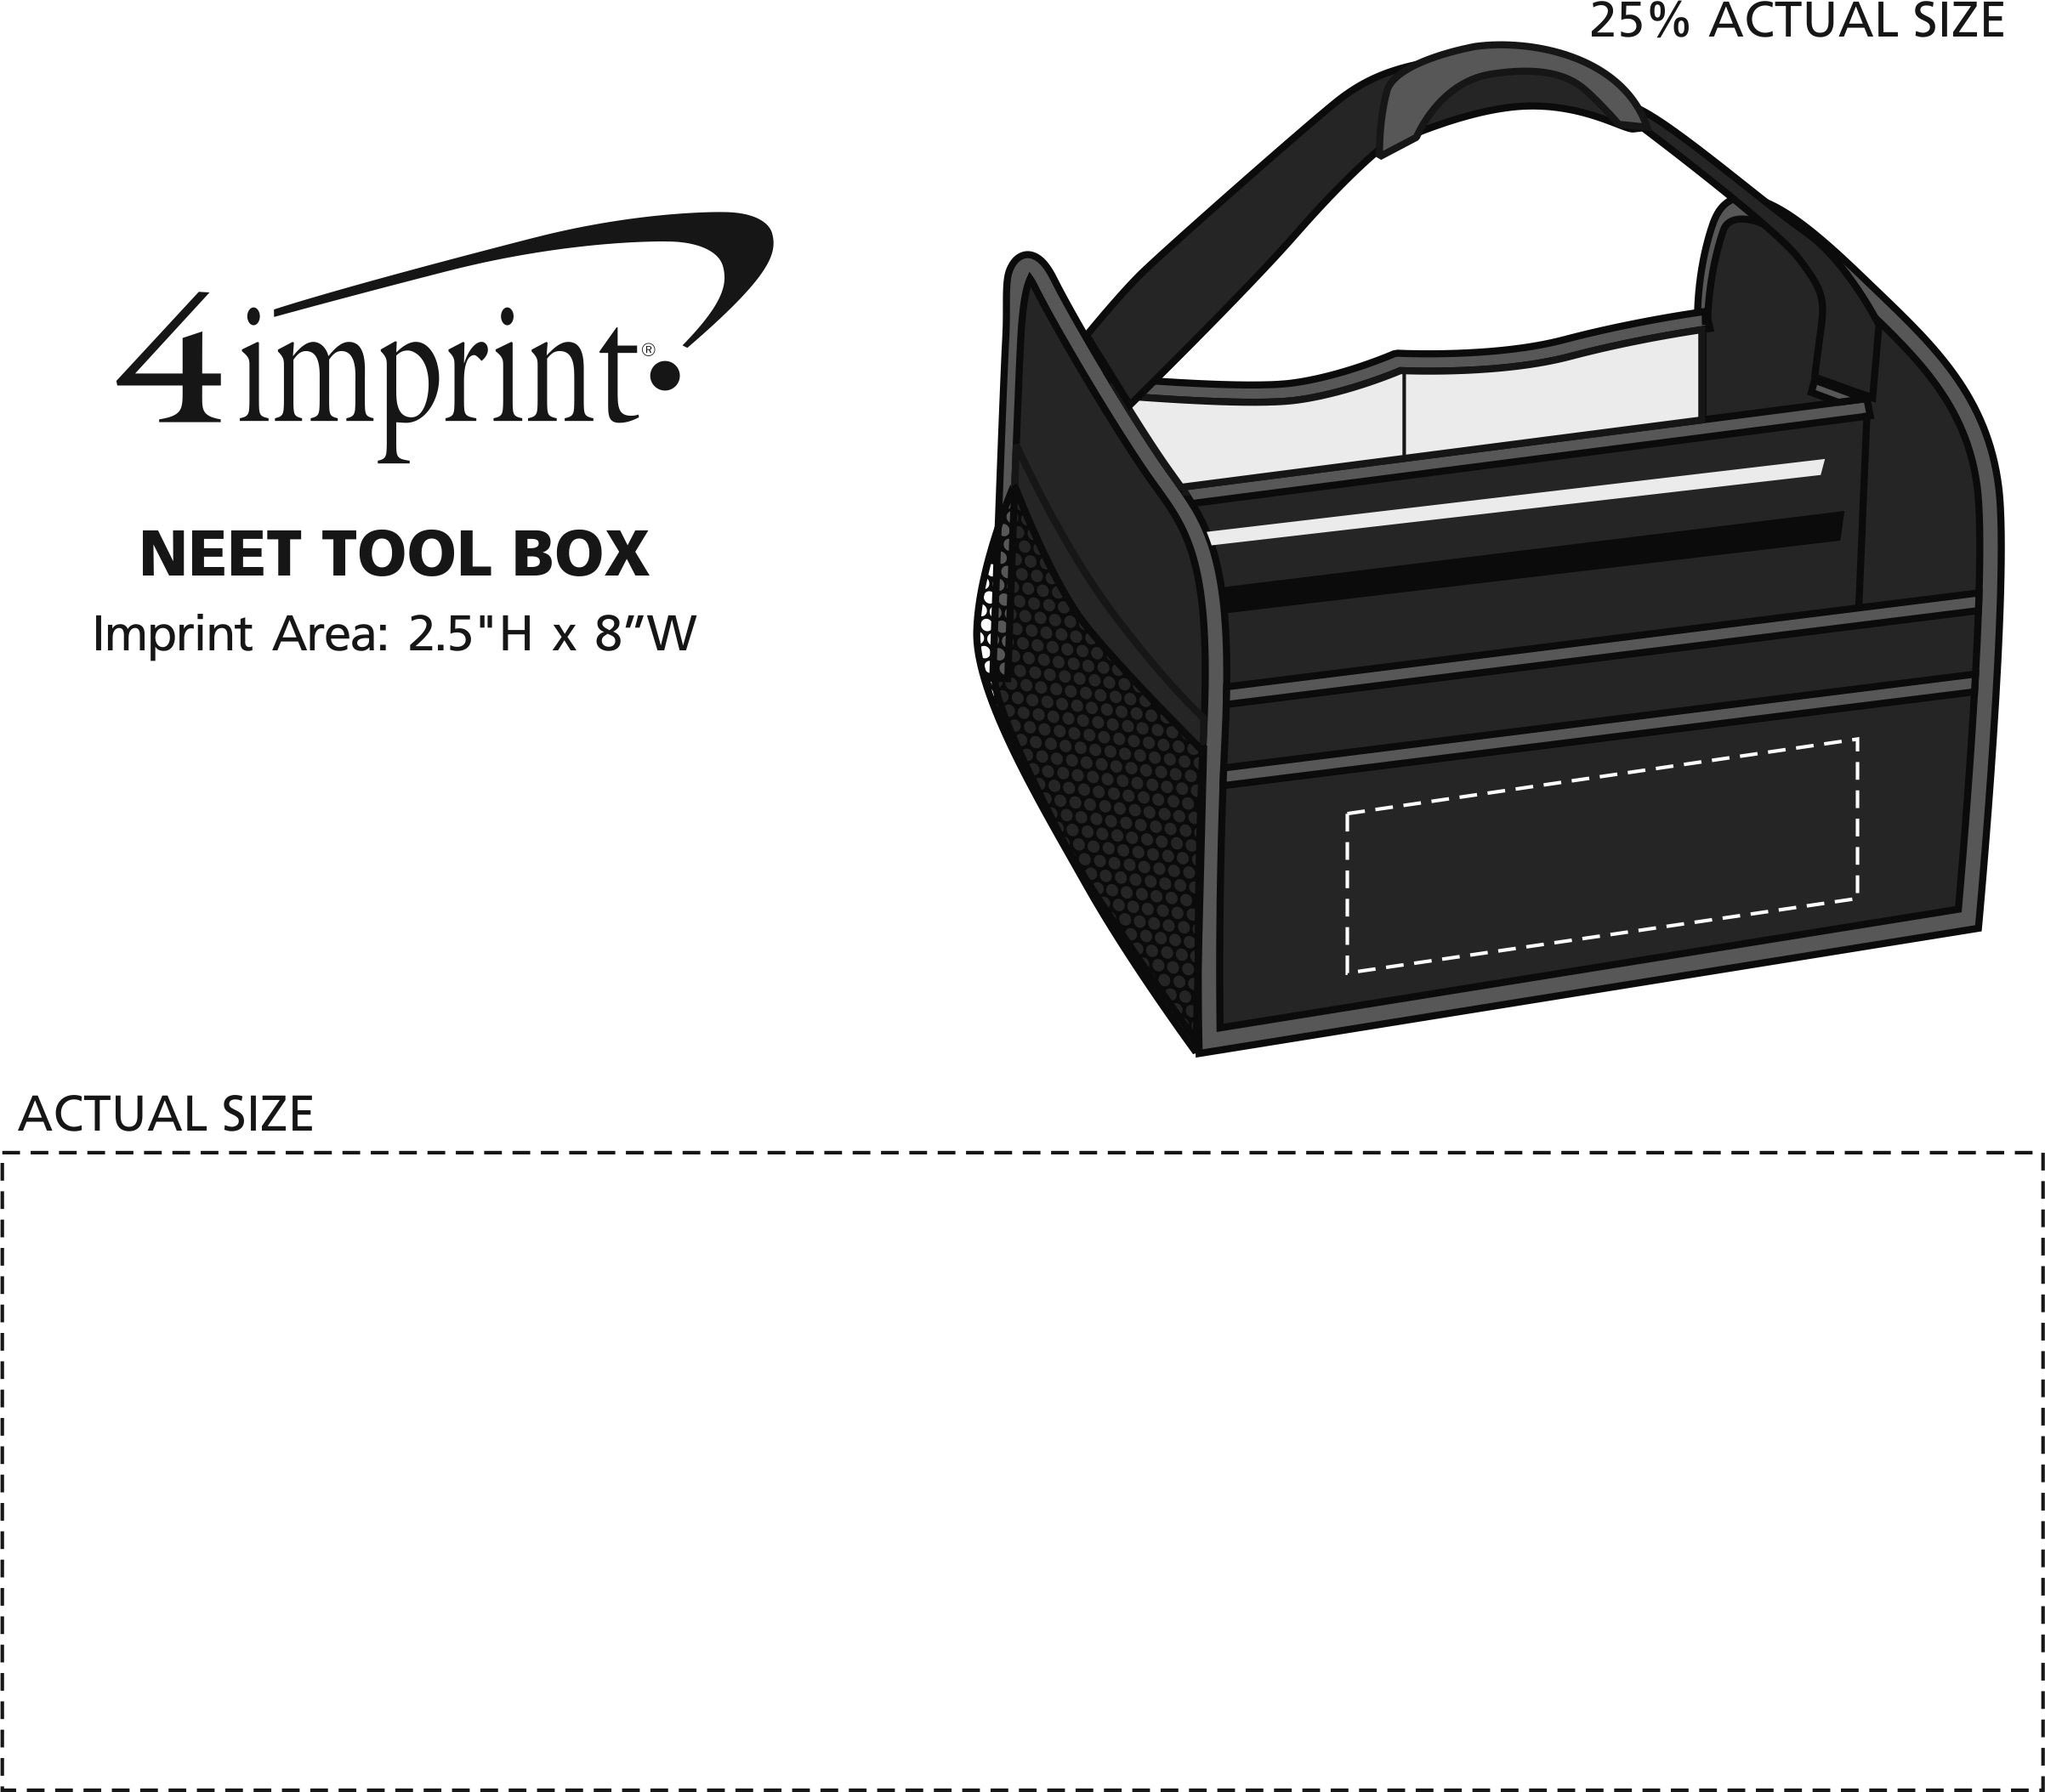 Imprint Area of Neet Tool Box